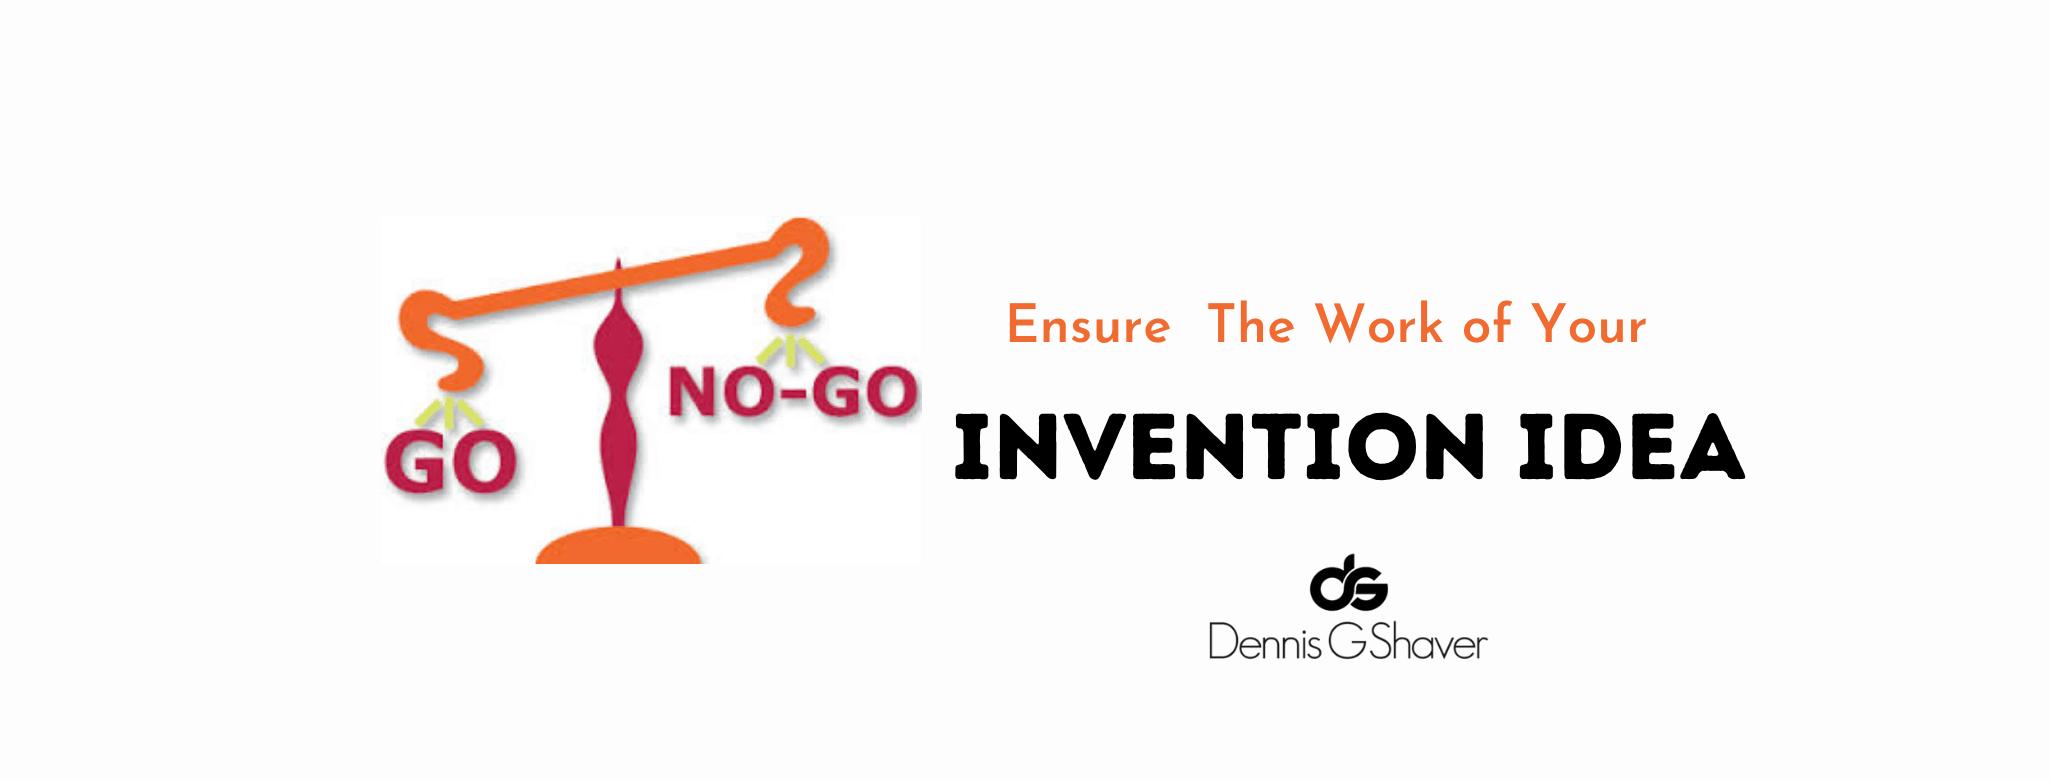 invention-idea-validation